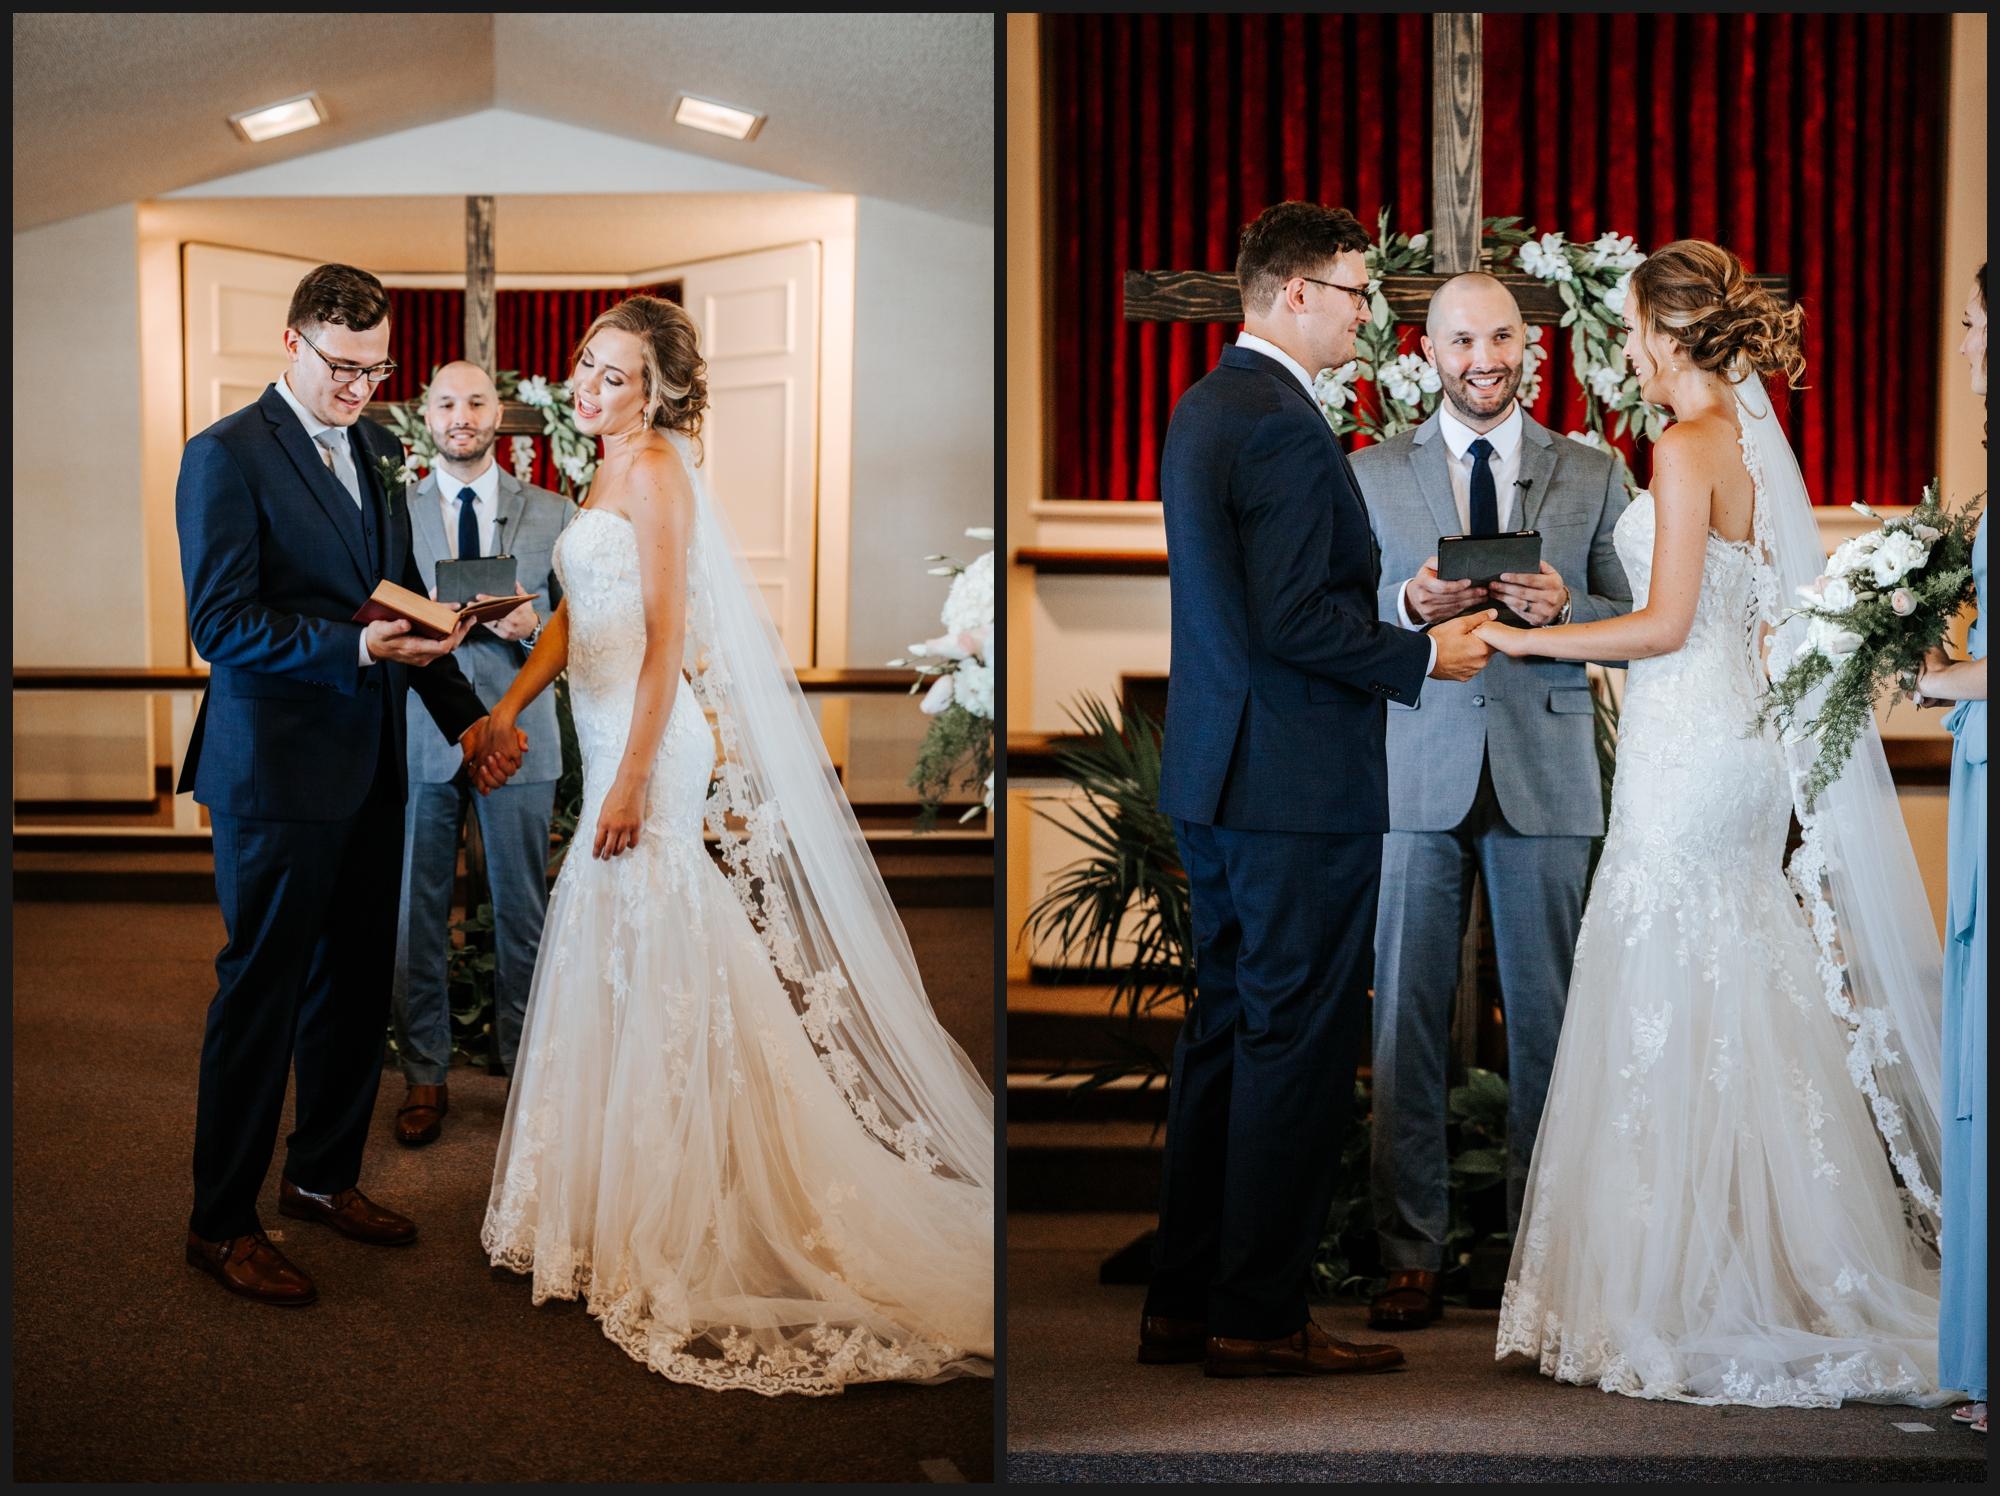 Orlando-Wedding-Photographer-destination-wedding-photographer-florida-wedding-photographer-bohemian-wedding-photographer_0017.jpg